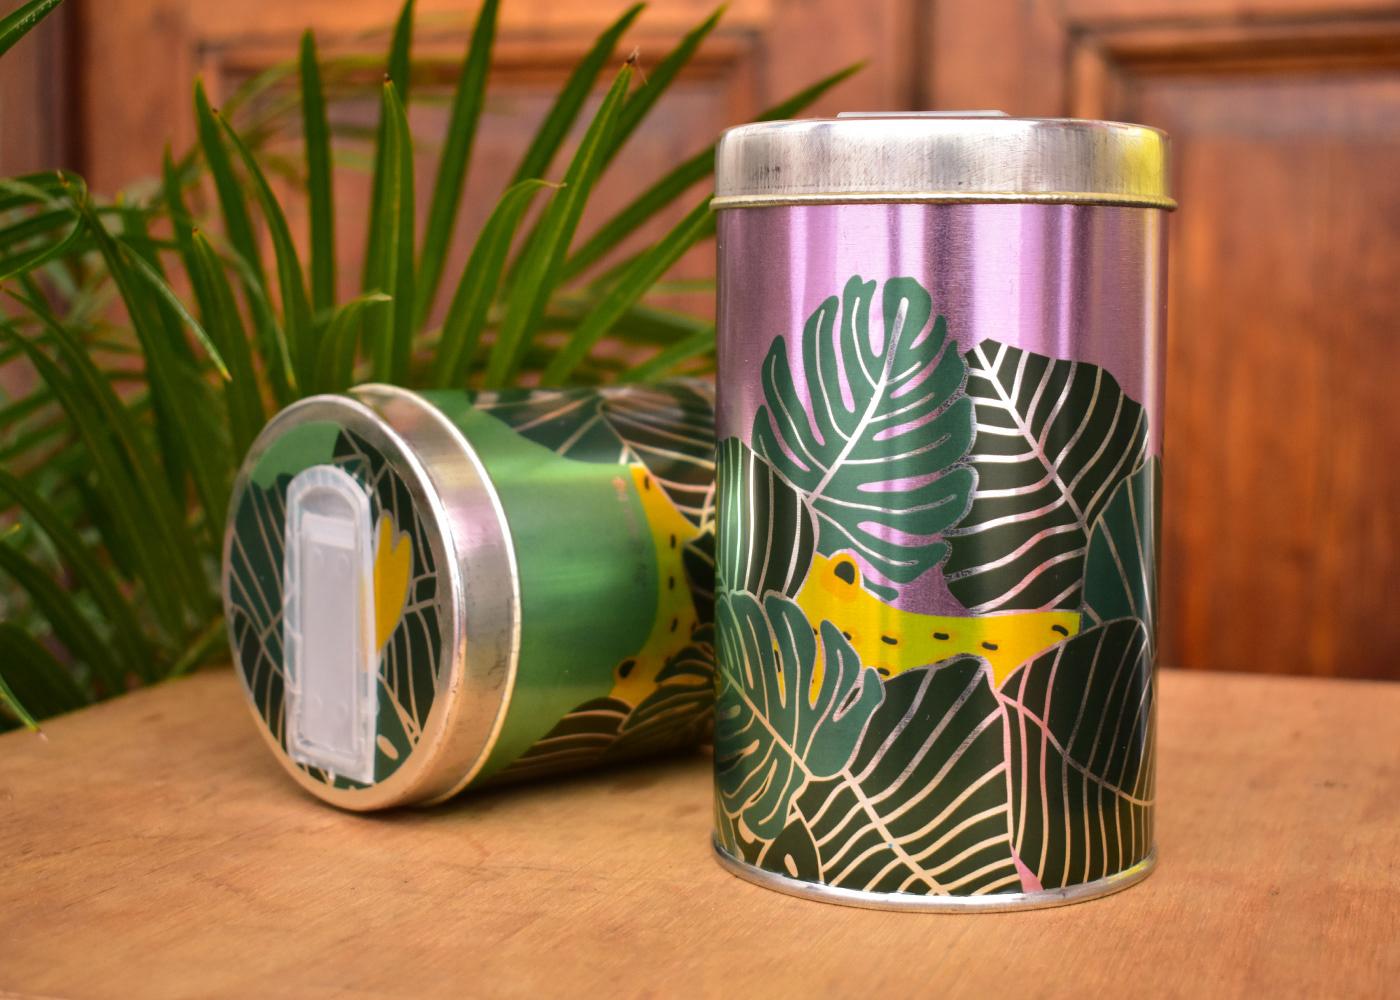 Image may contain: table, soft drink and mug